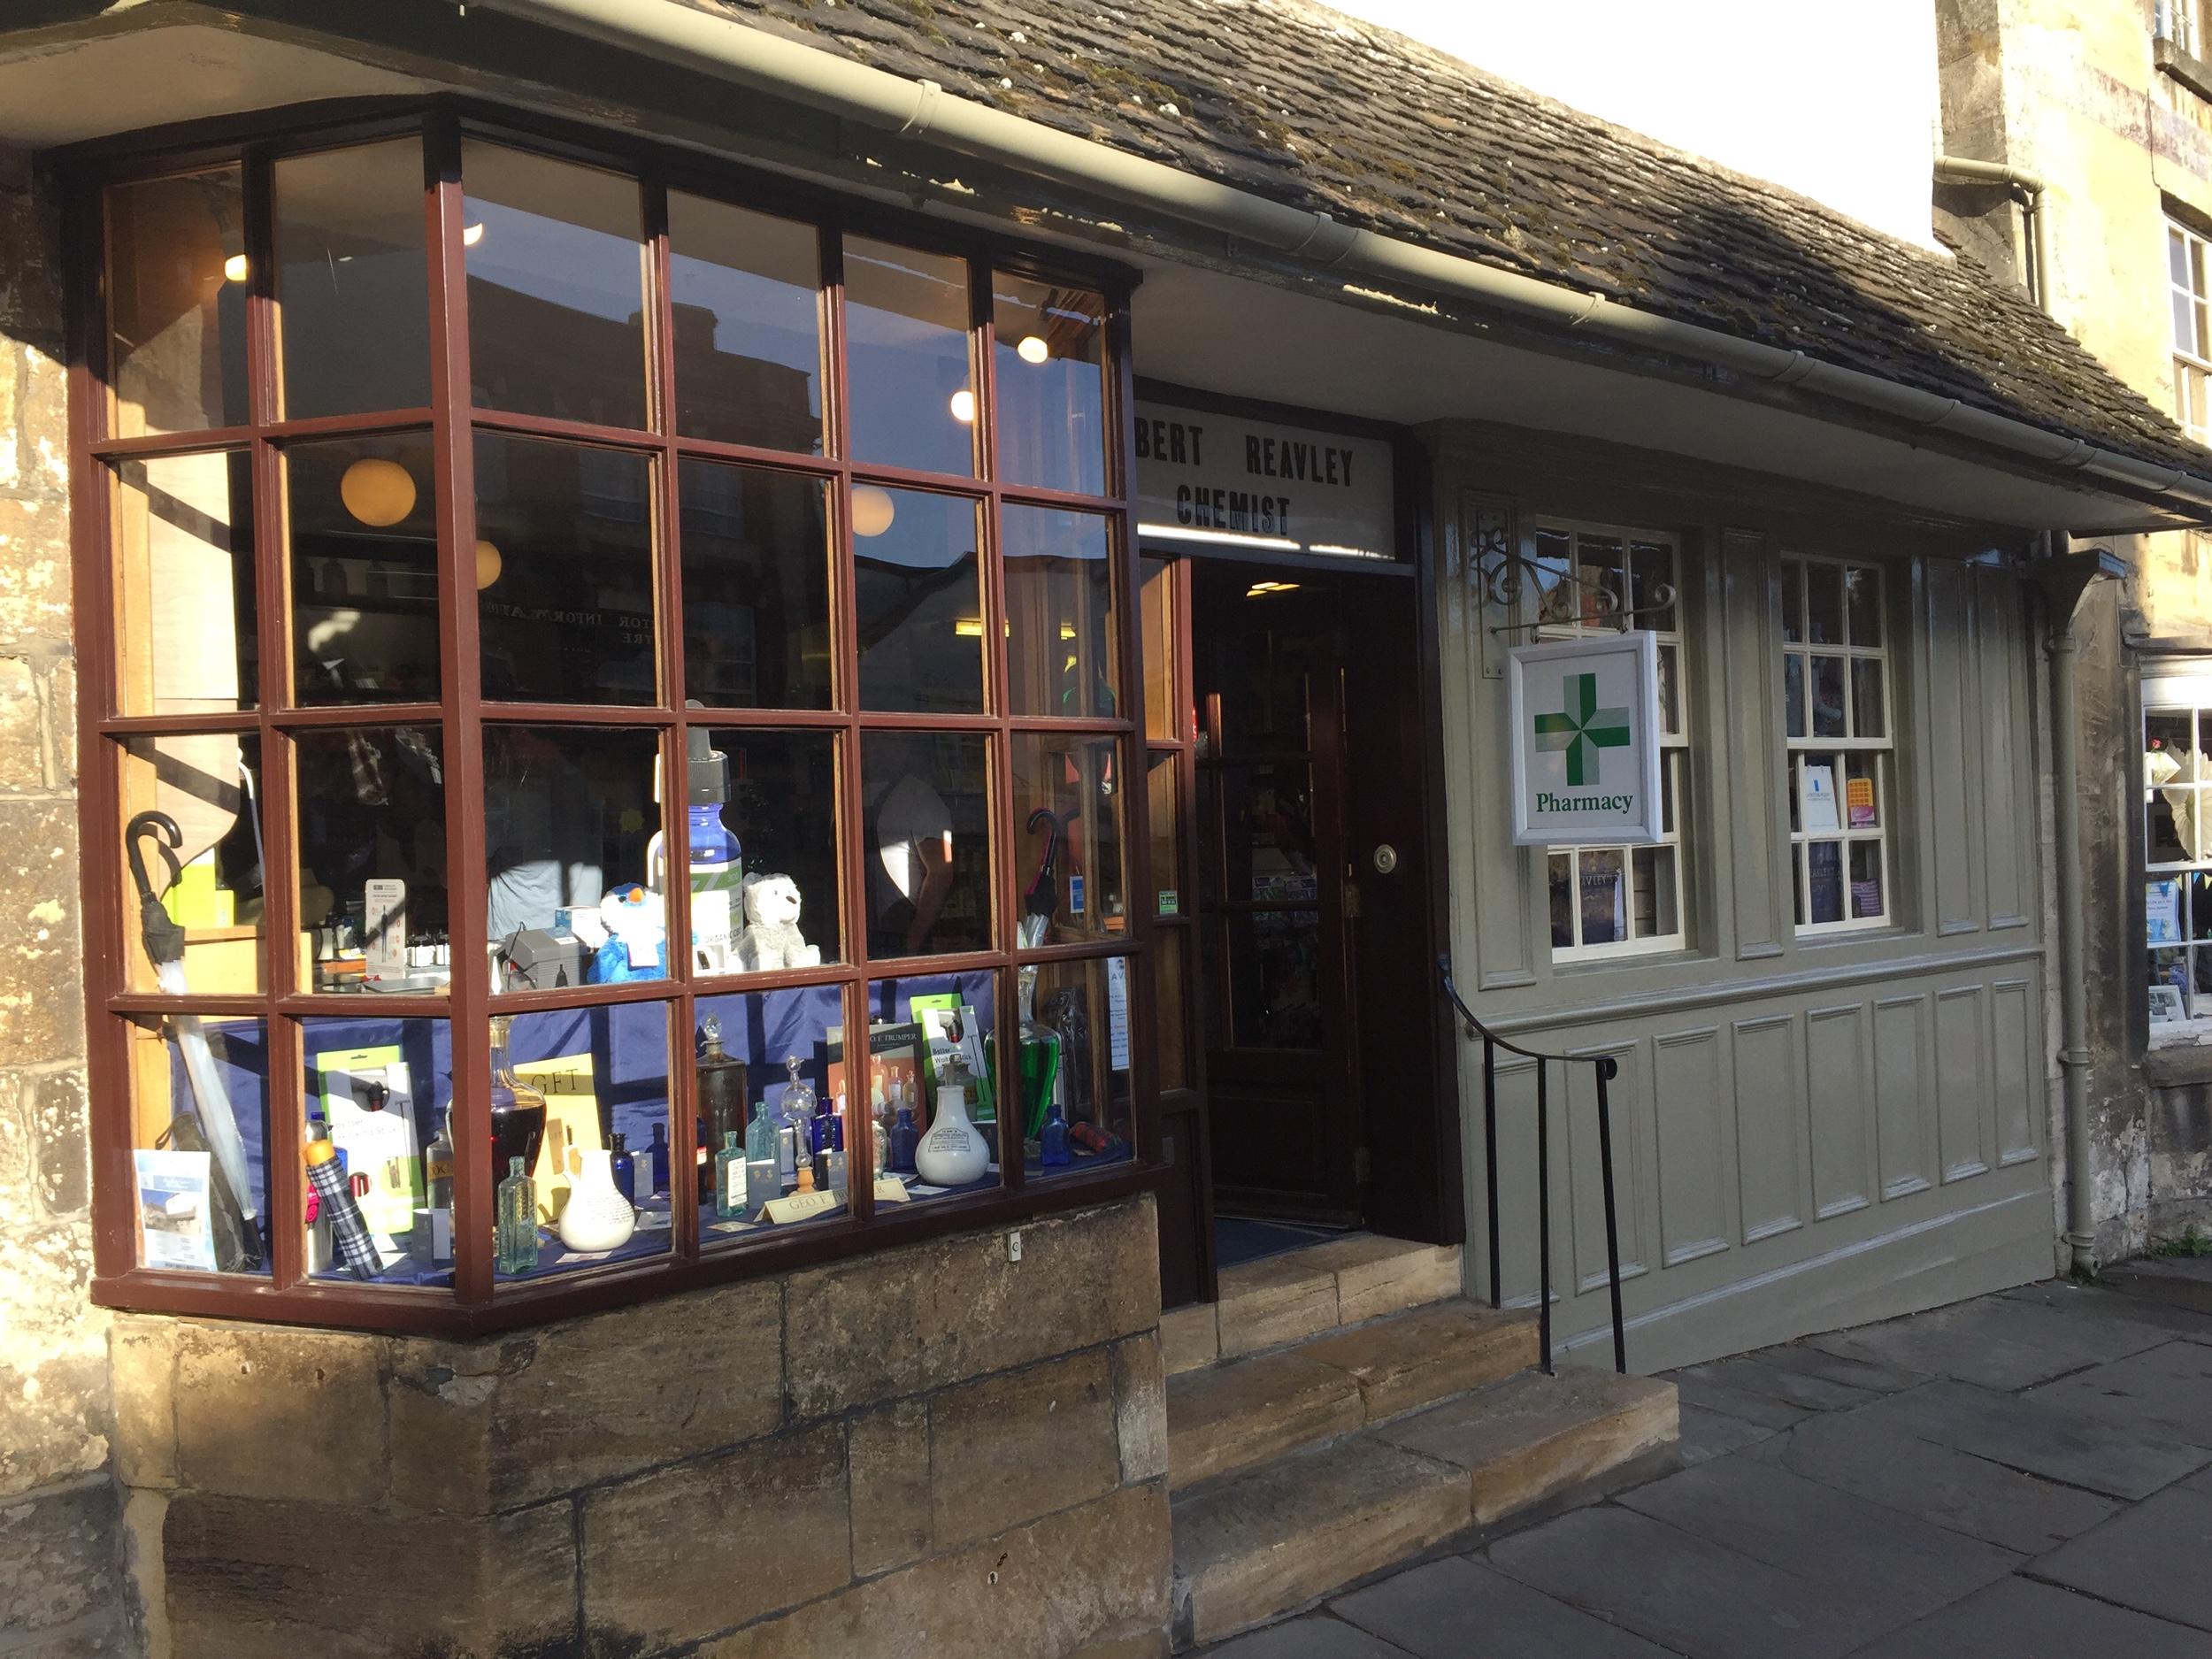 La più antica farmacia d'Inghilterra a Burford